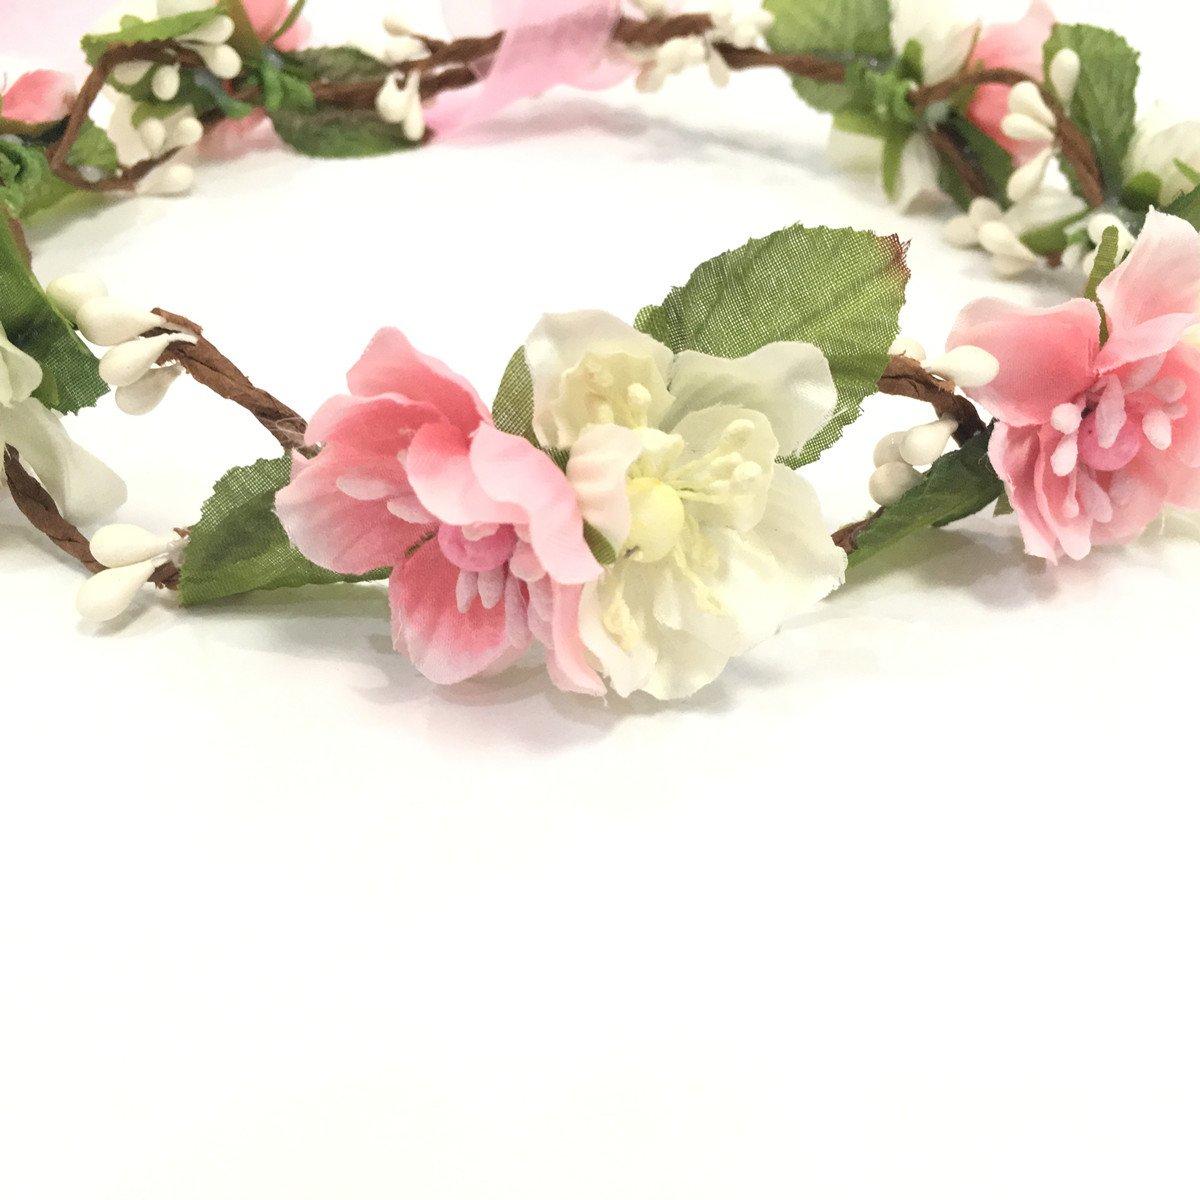 Amazon bridal flower crown floral crown wedding wreath amazon bridal flower crown floral crown wedding wreath headband garland women pink beauty izmirmasajfo